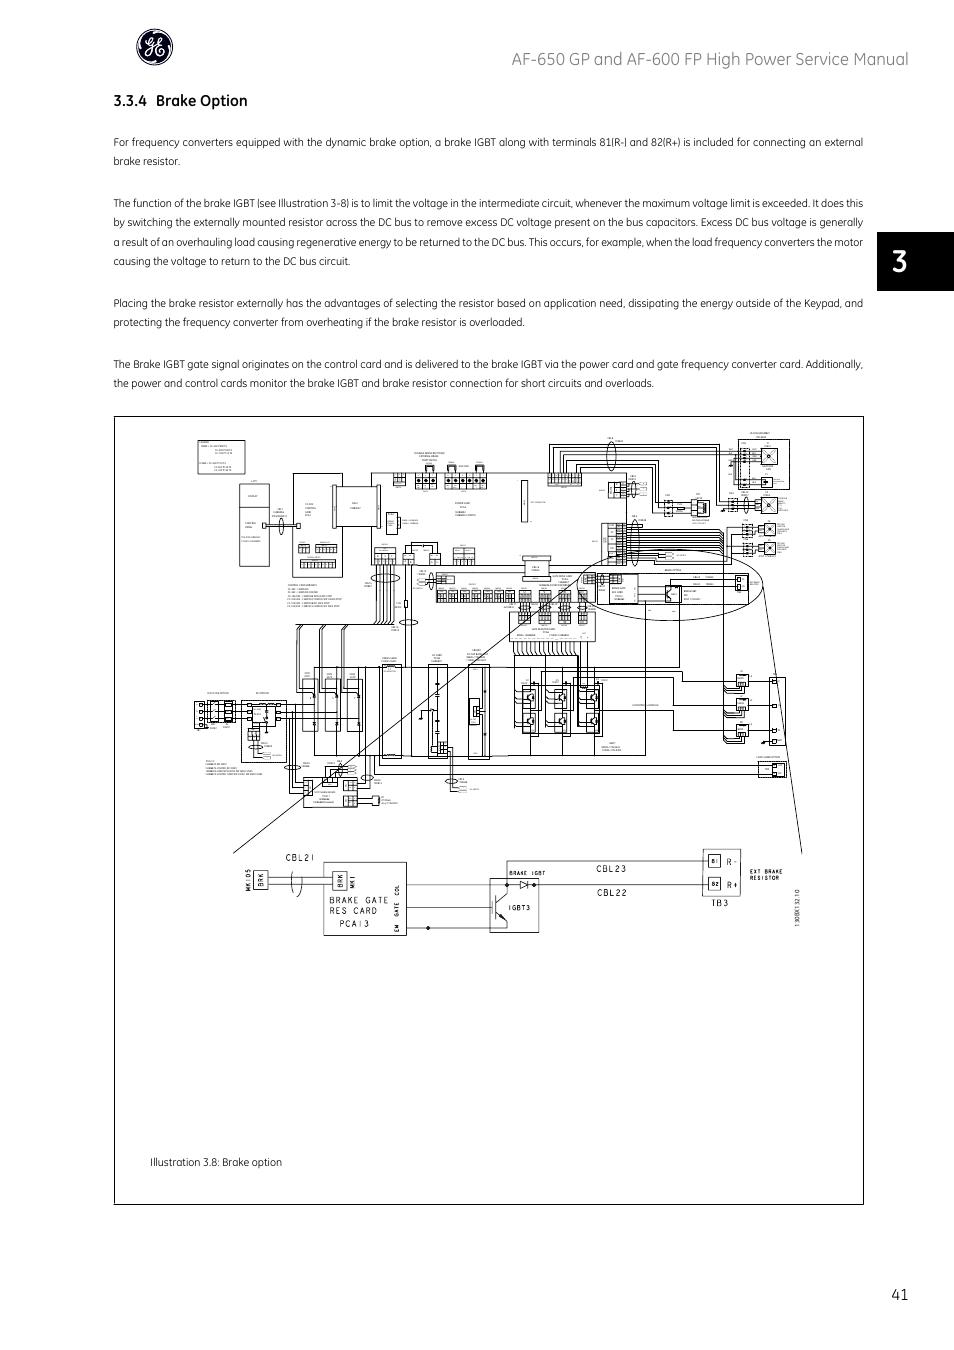 hight resolution of 4 brake option s l2 t l3 m sensors current scr gate